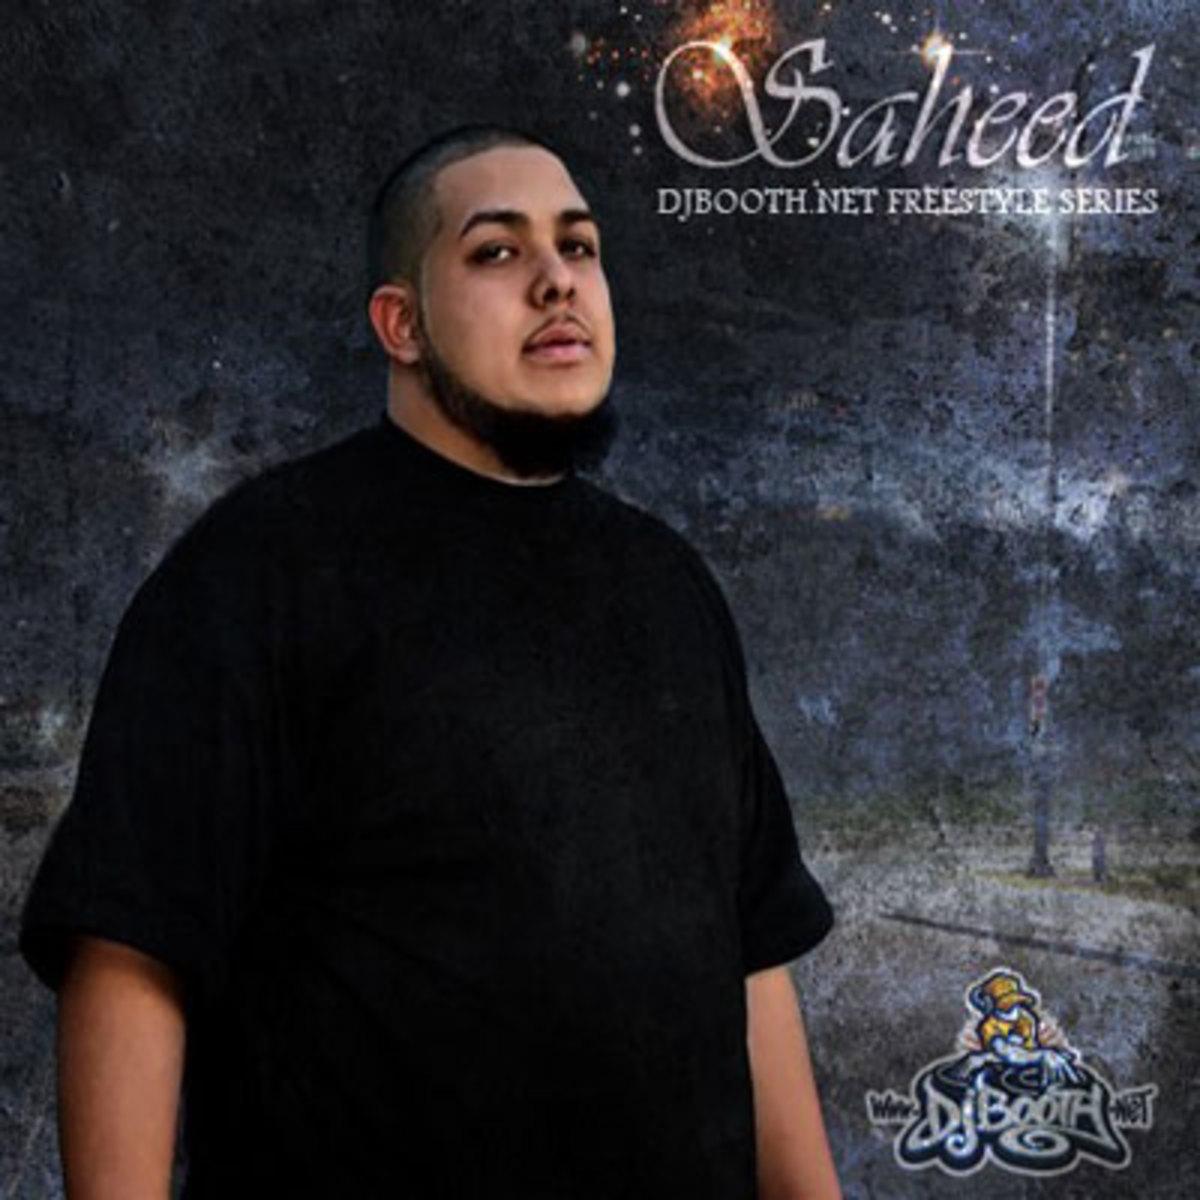 saheed-freestyle.jpg